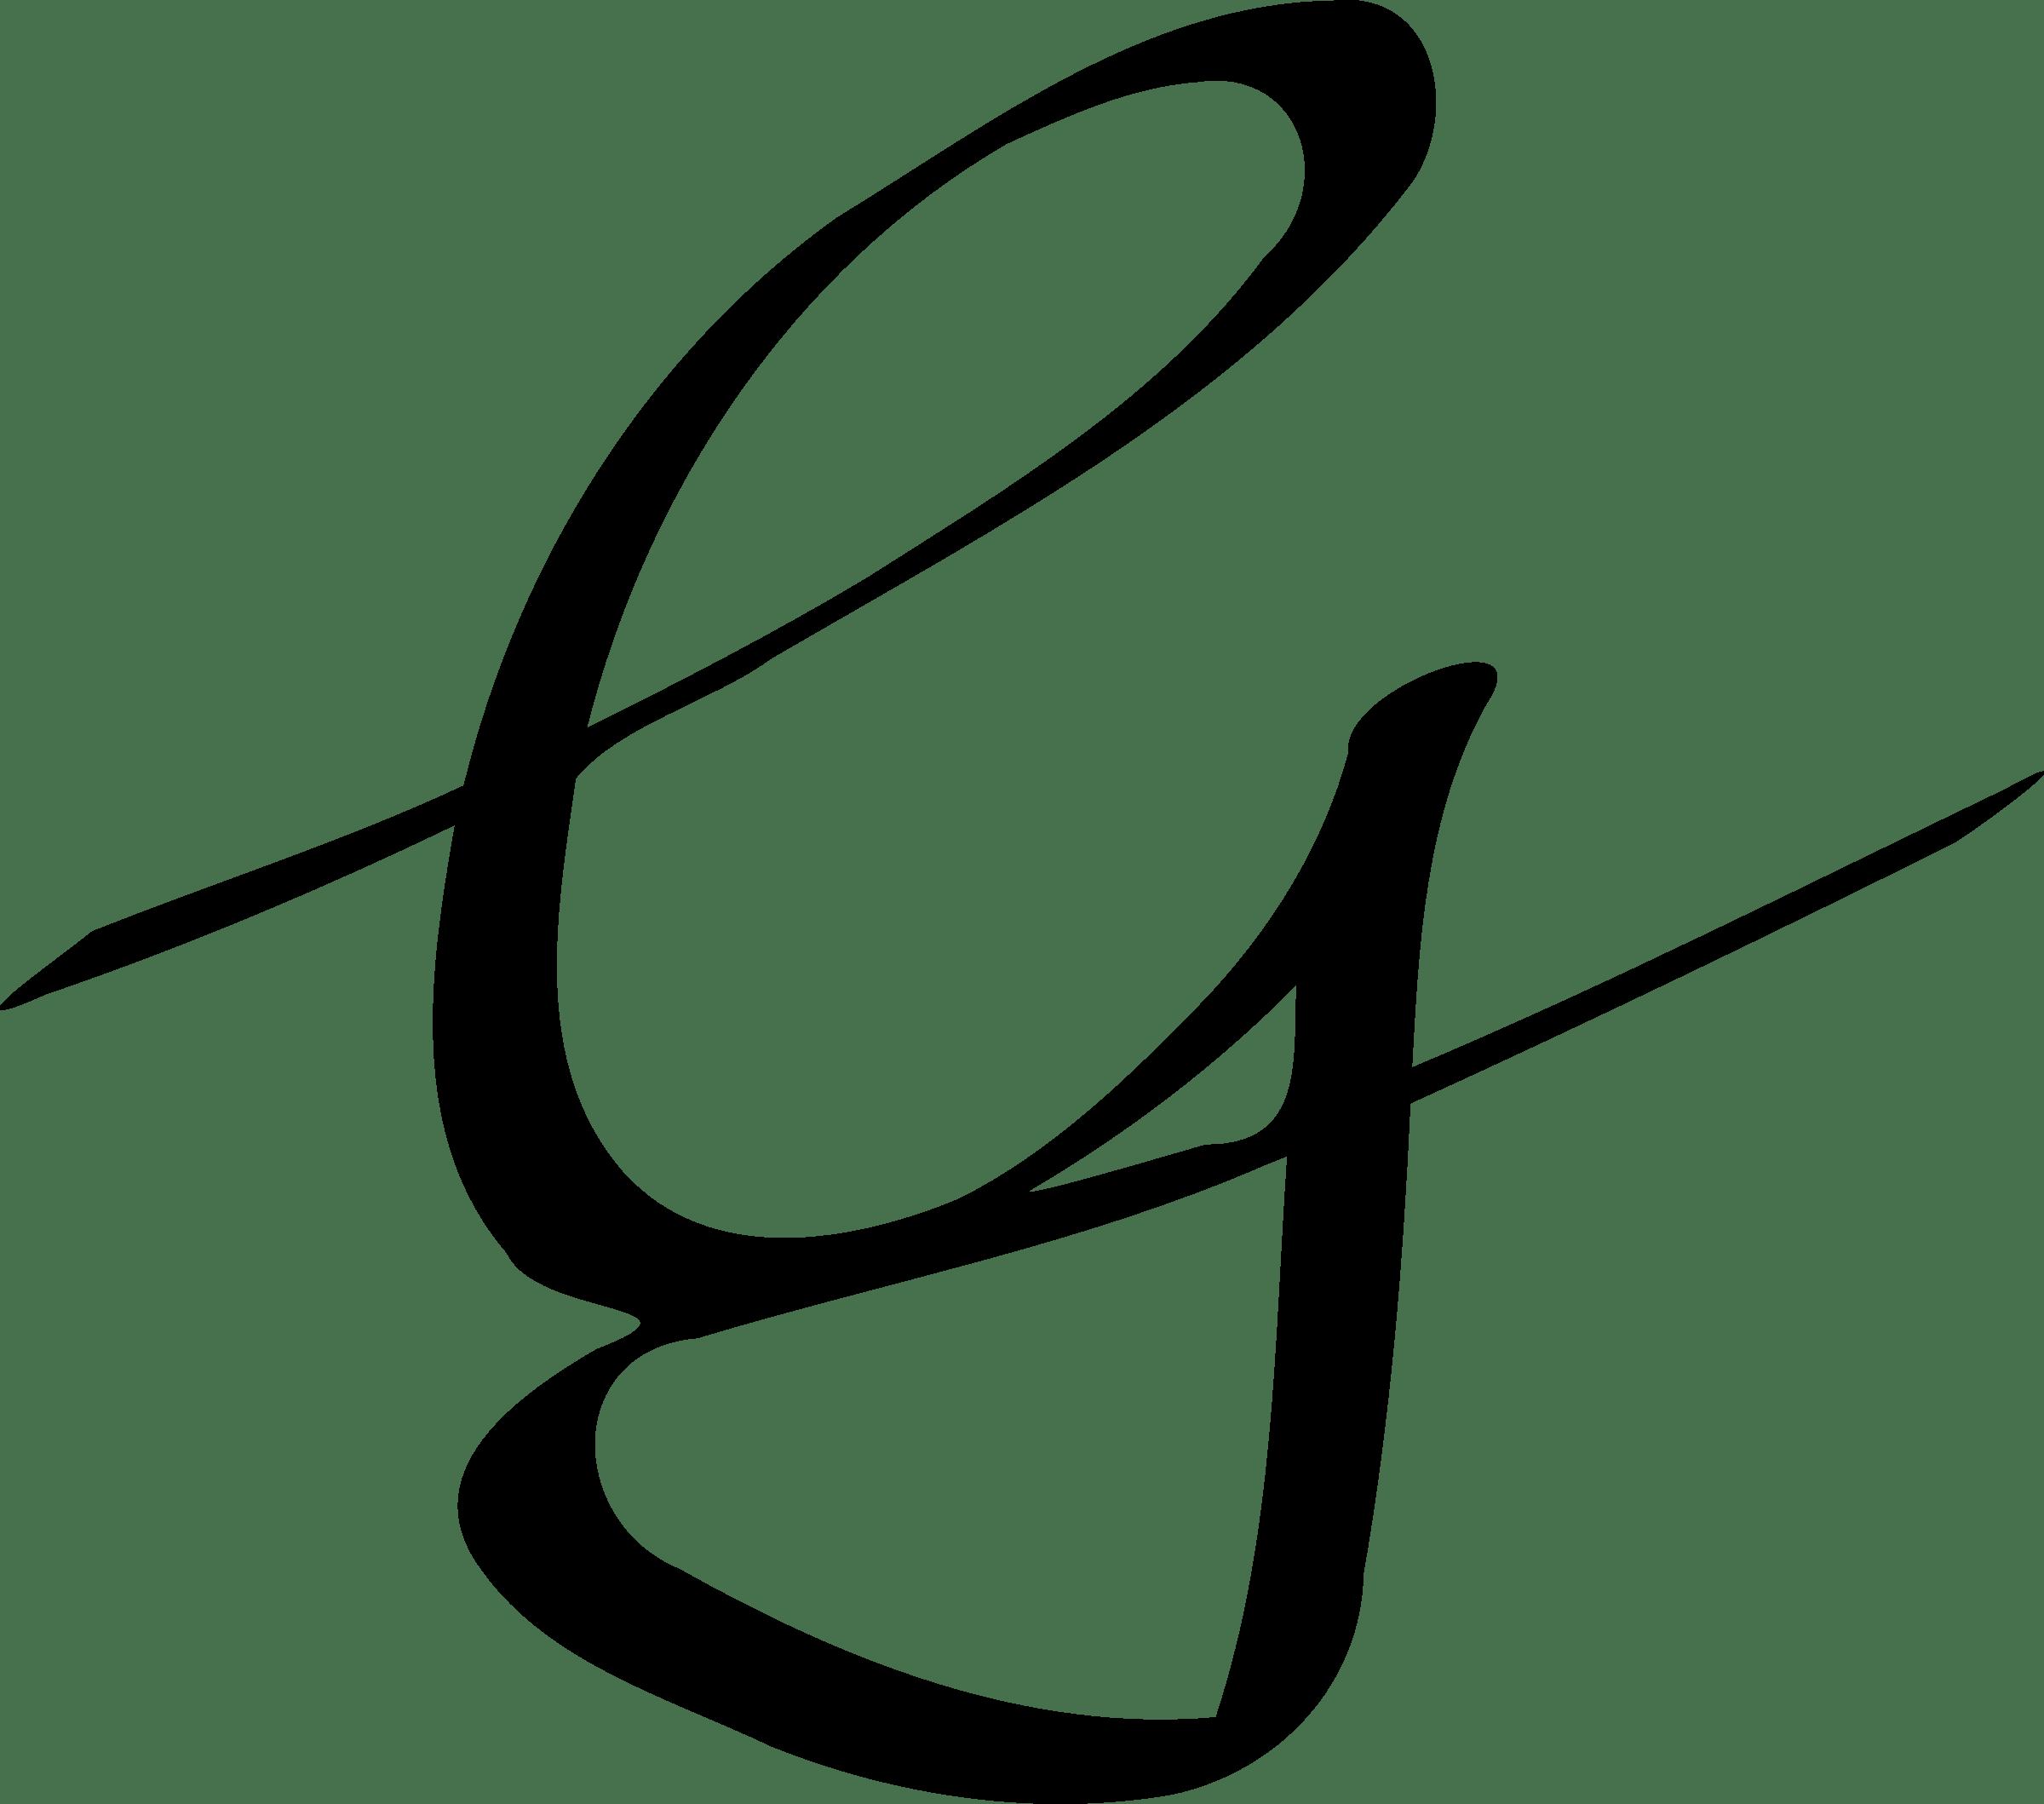 Handwriting Cursive Capital G